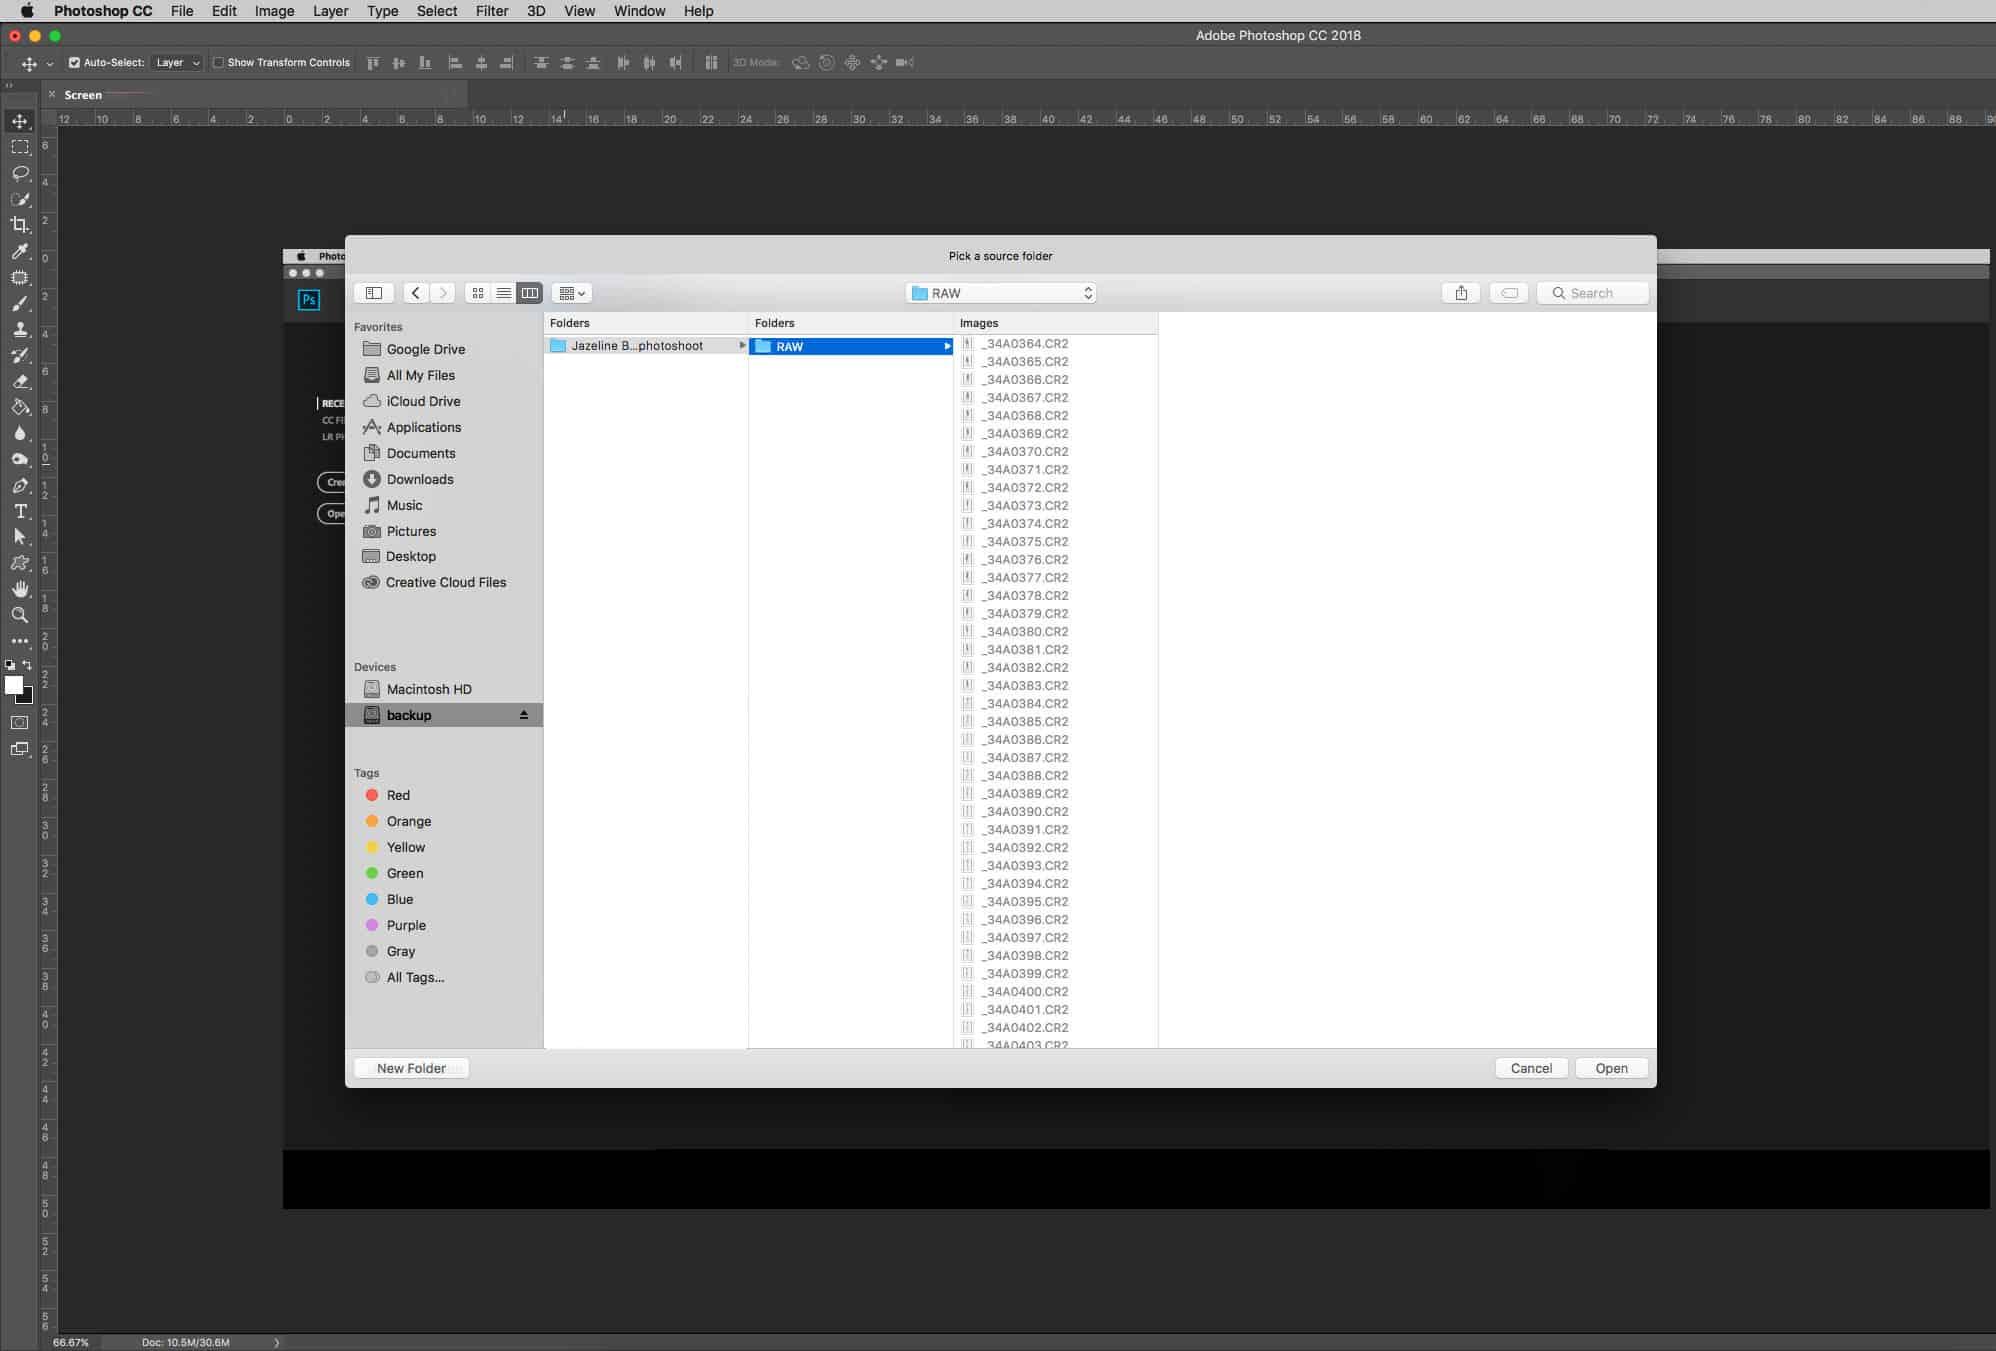 convert-photoshop-image-processer-step-3